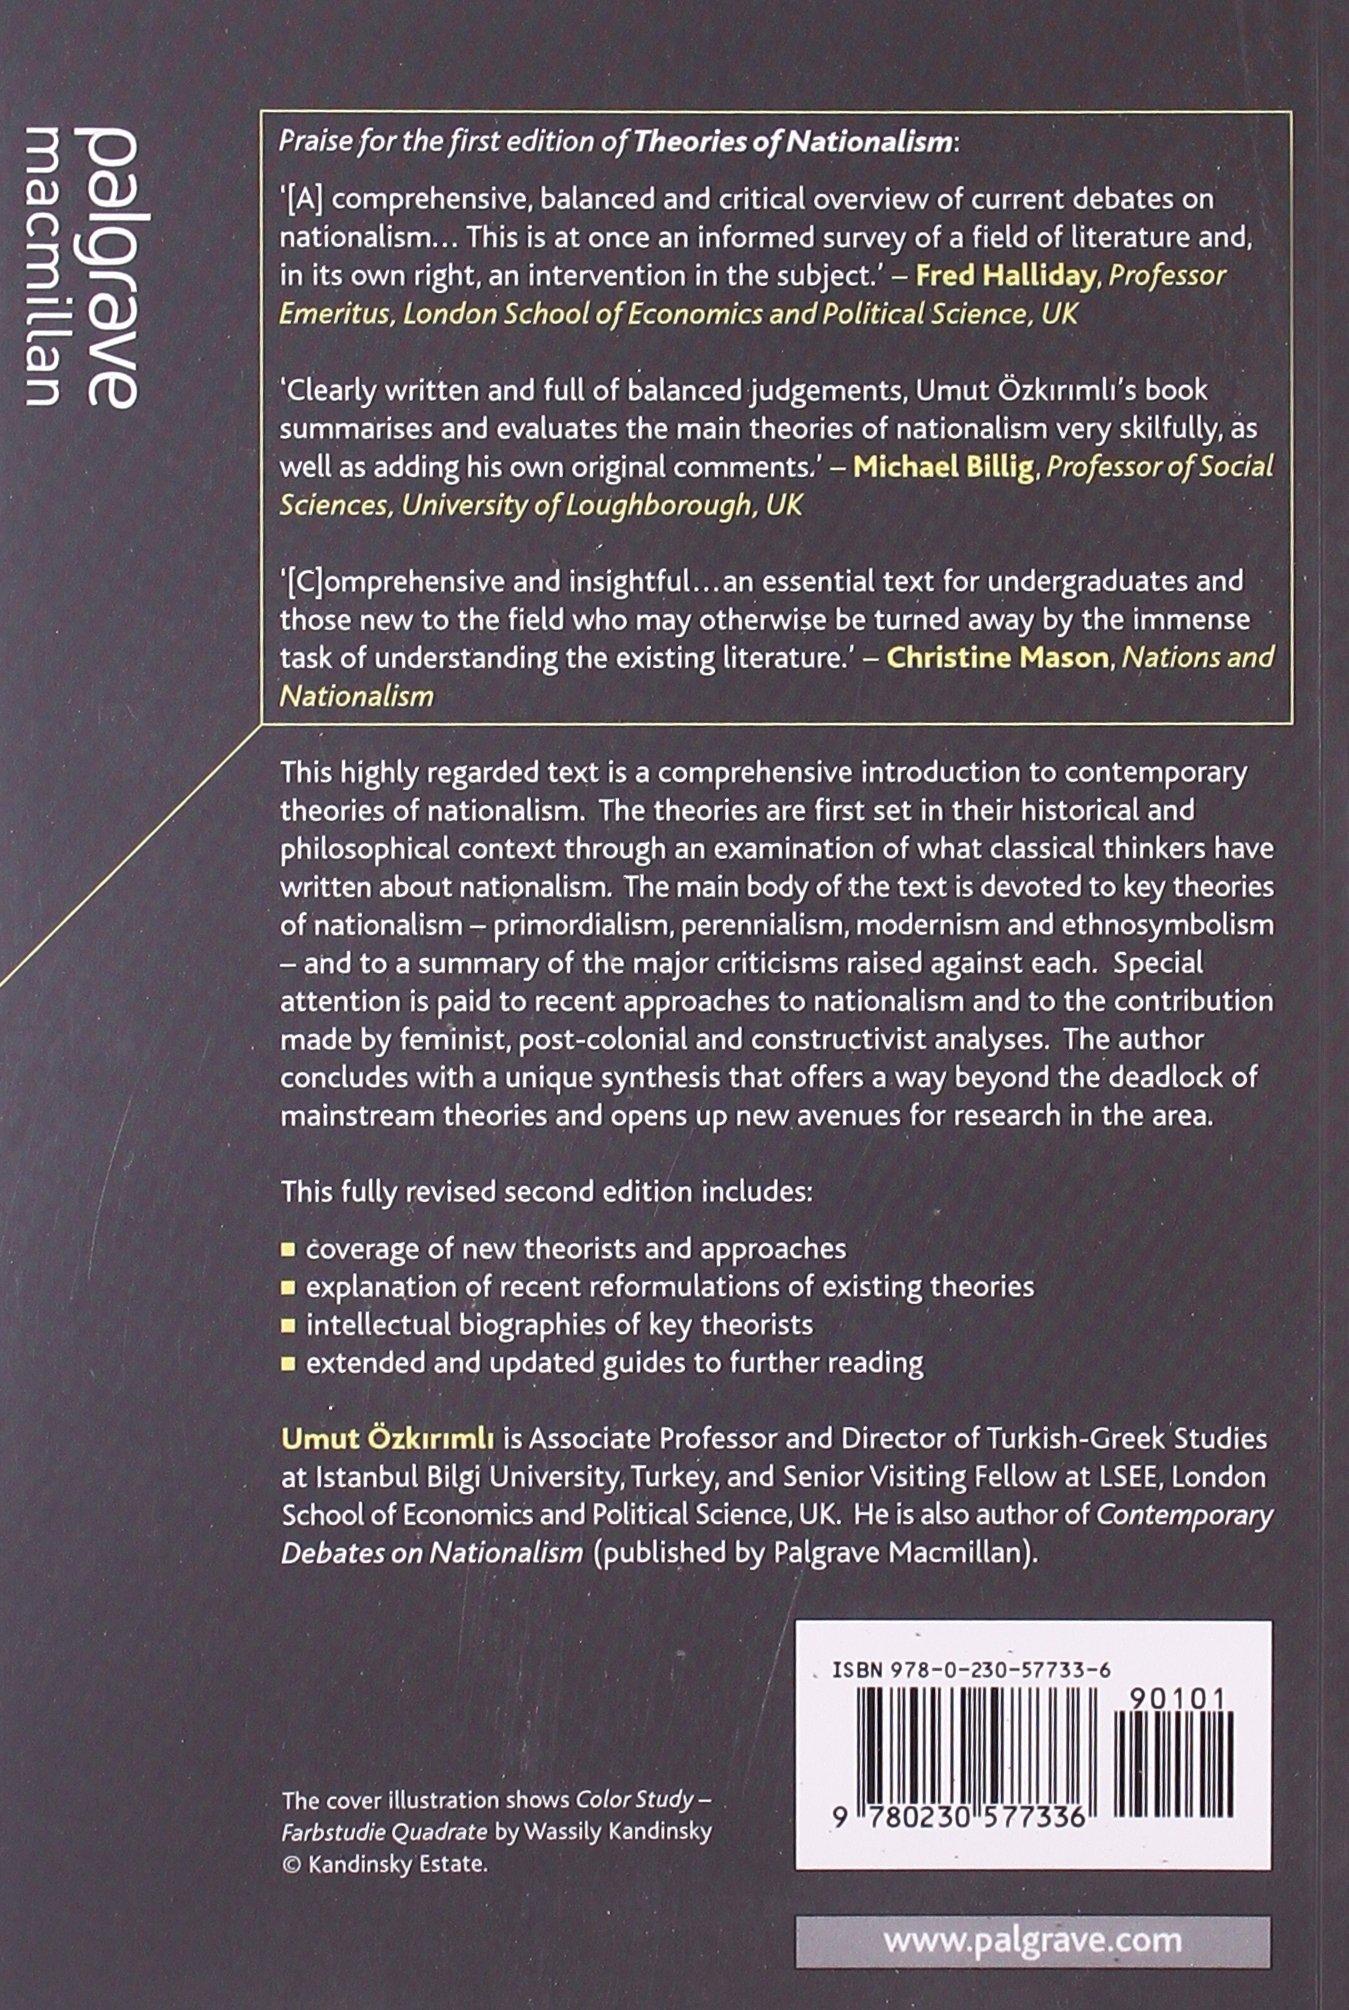 Theories of Nationalism: A Critical Introduction: Amazon.co.uk: Umut Ozkirimli: 9780230577336: Books